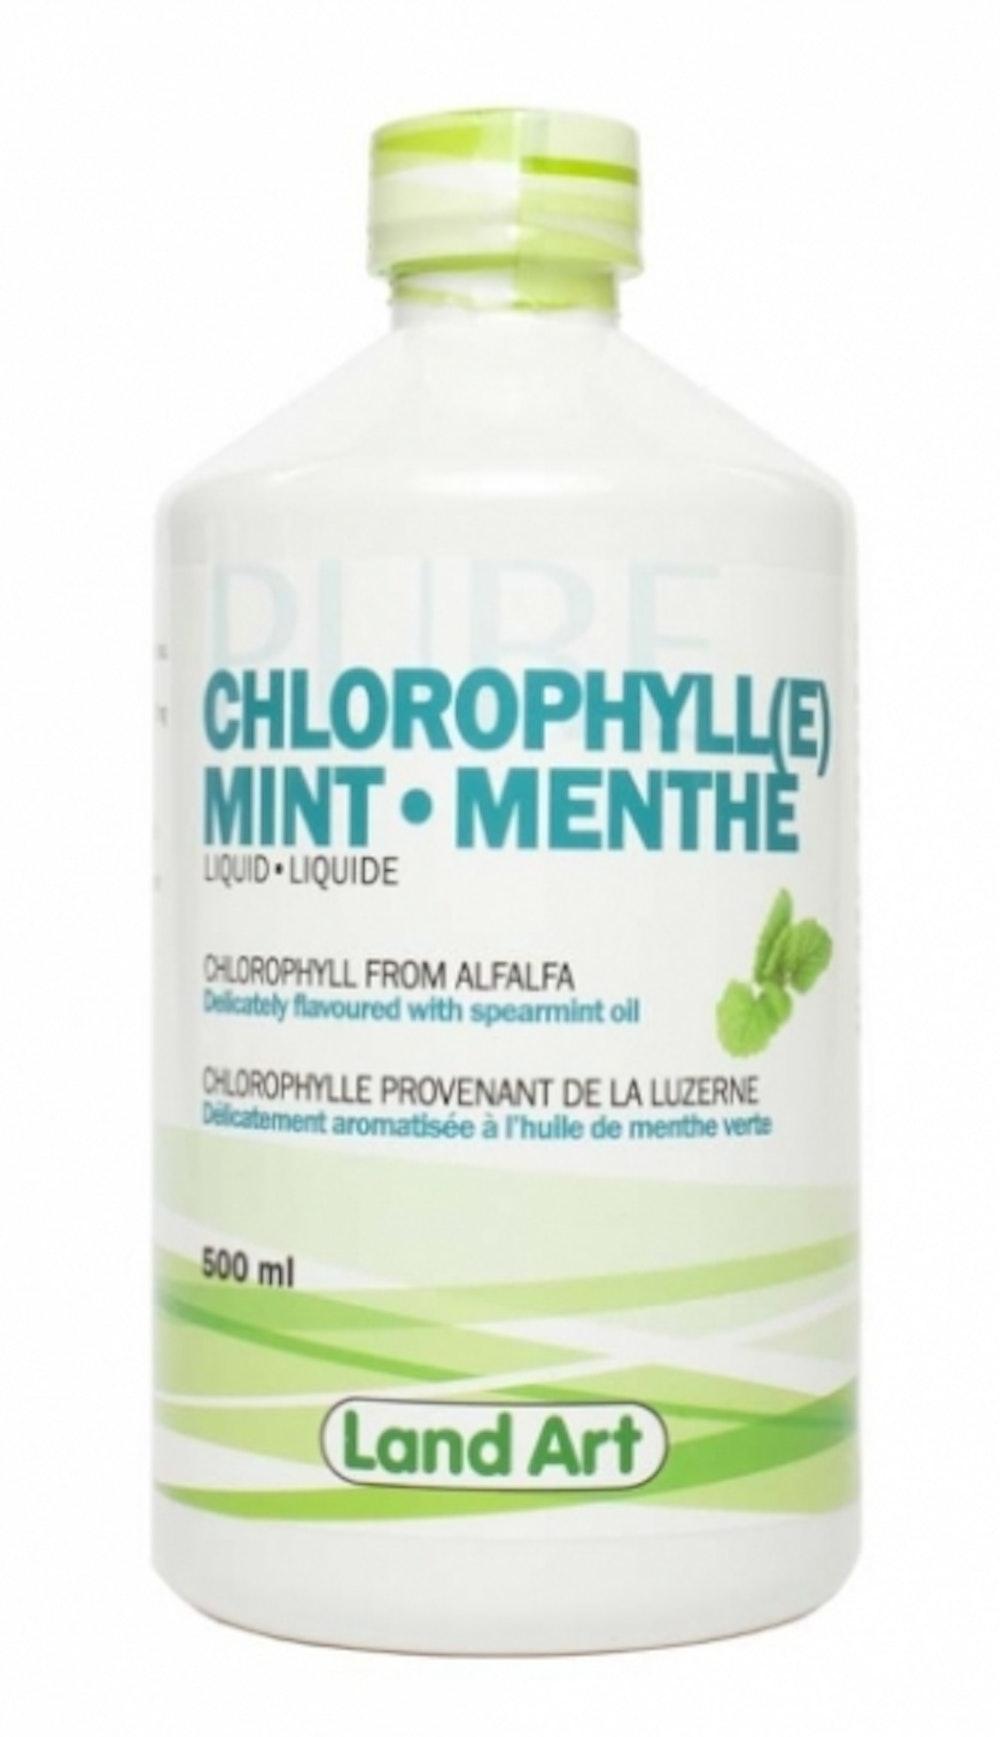 Chlorophylle menthe